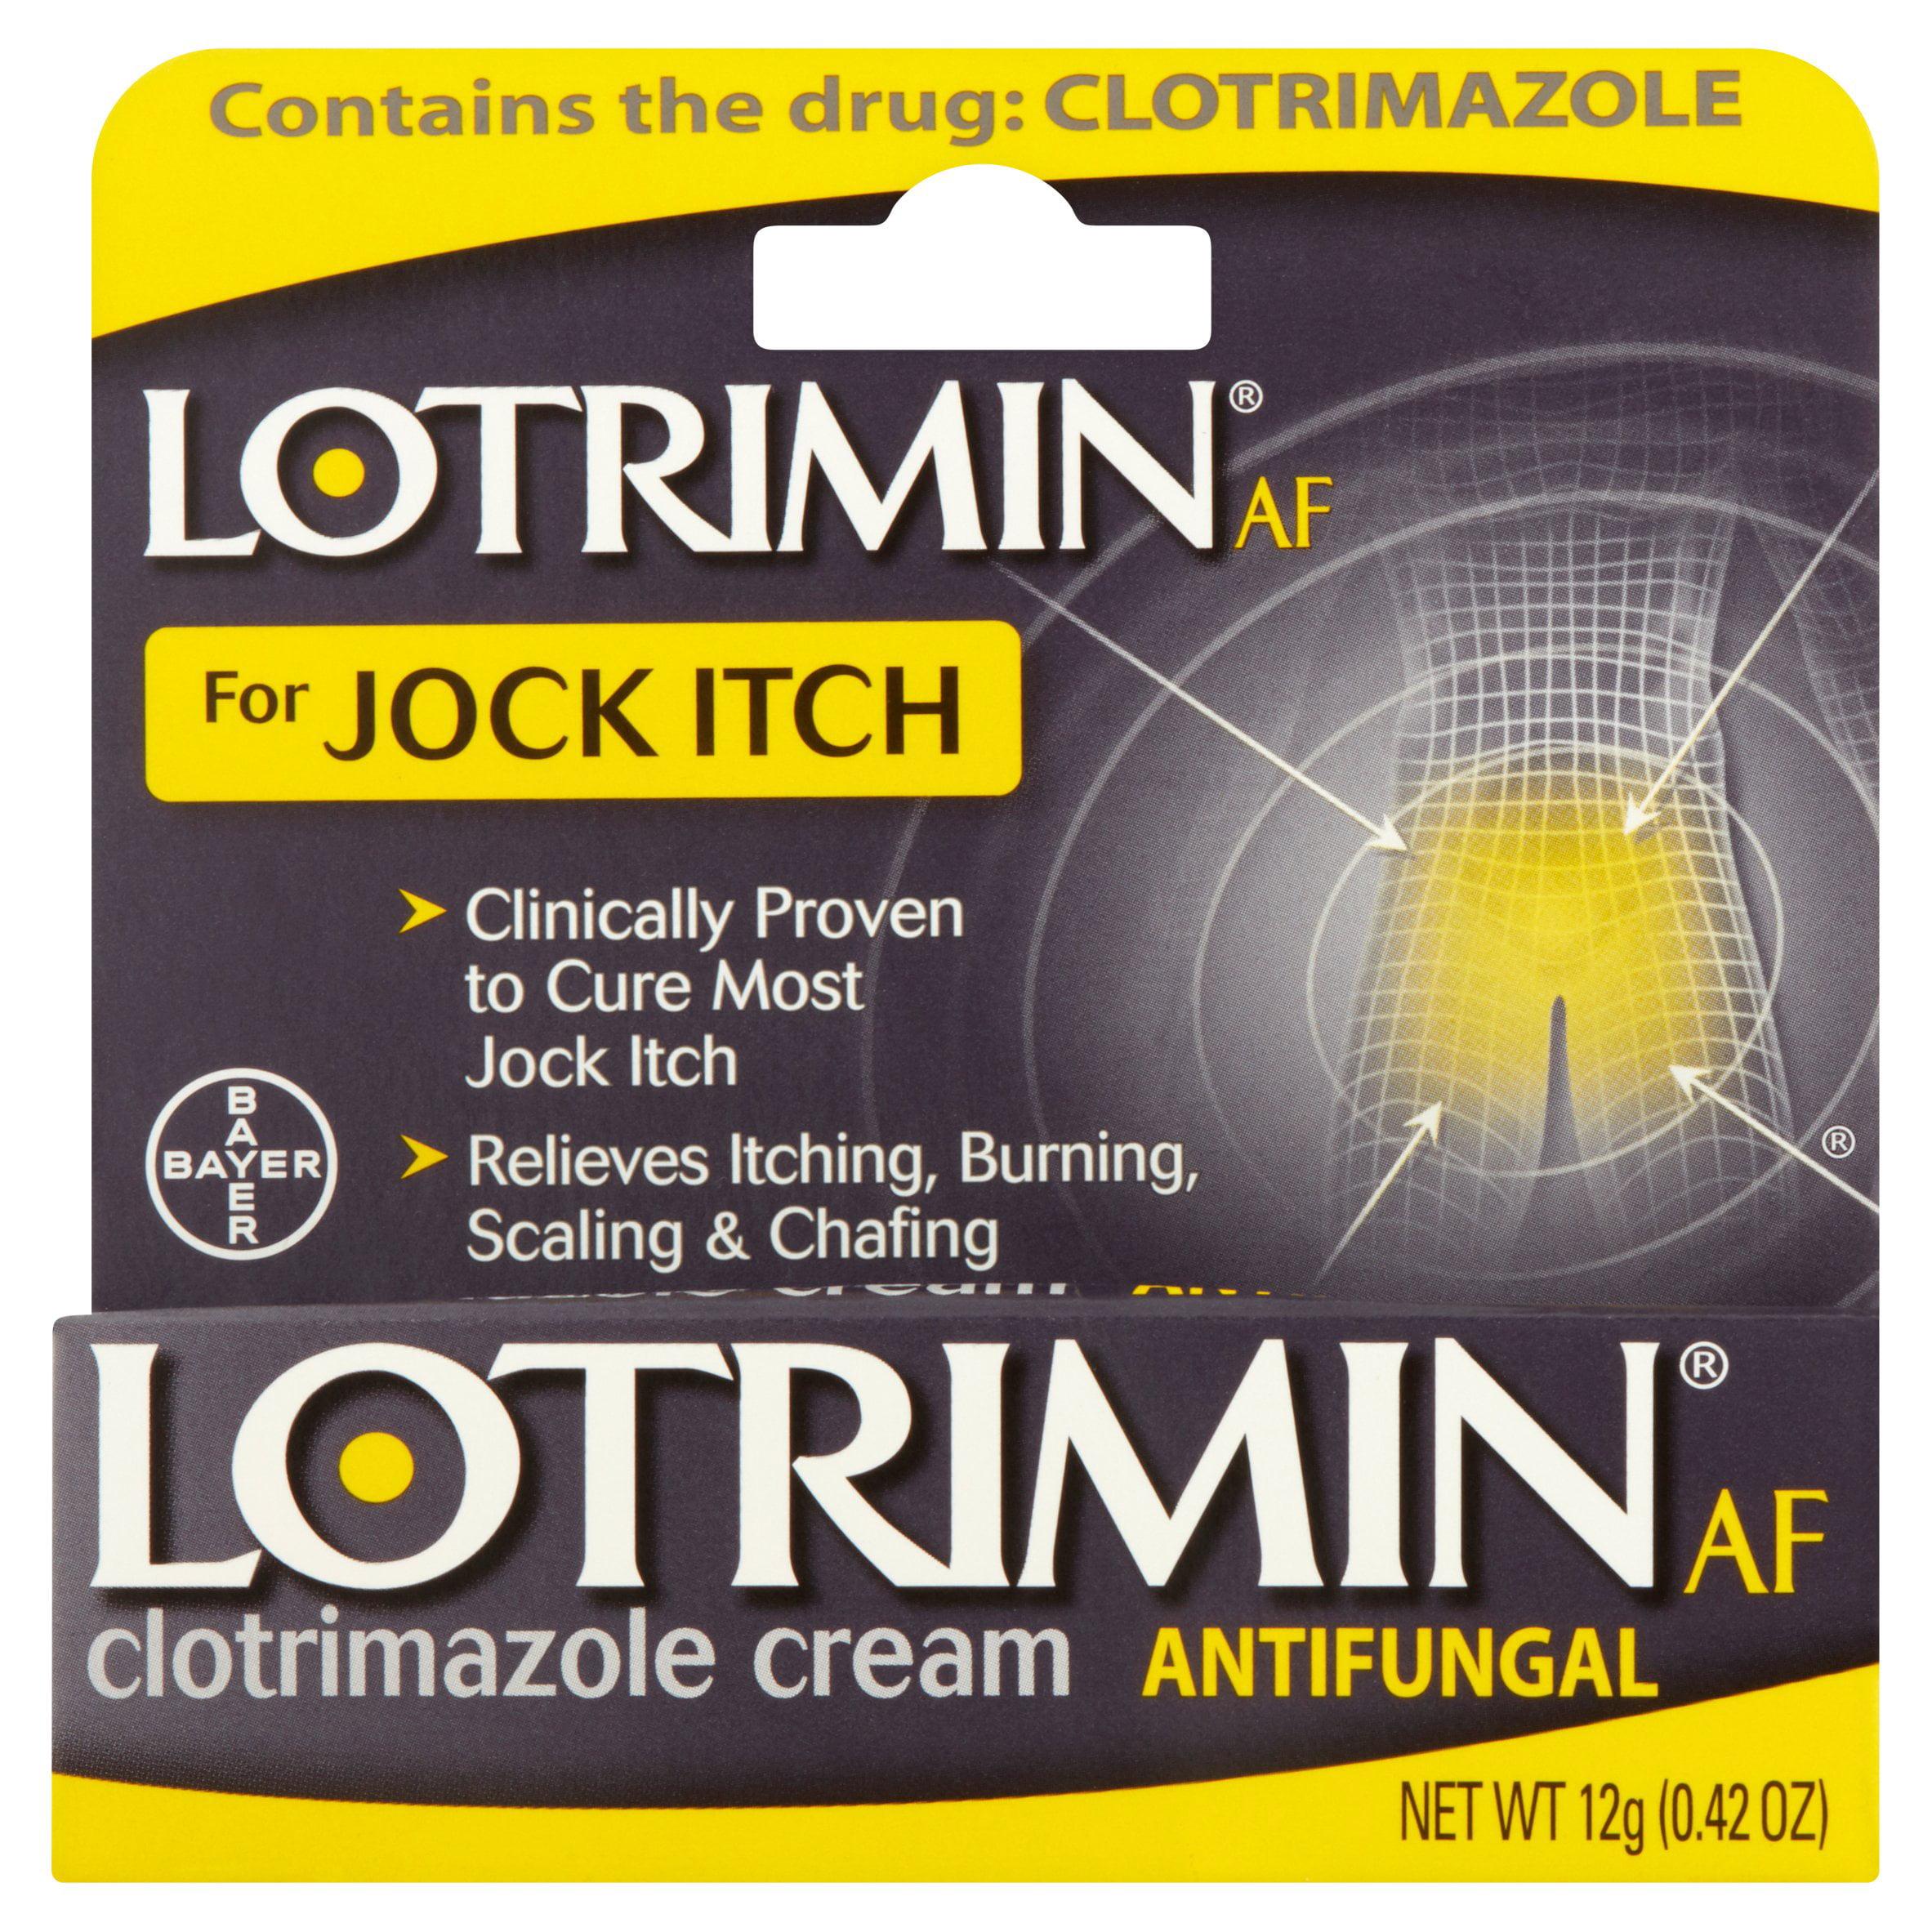 Lotrimin Antifungal Jock Itch Cream, 0.42Oz